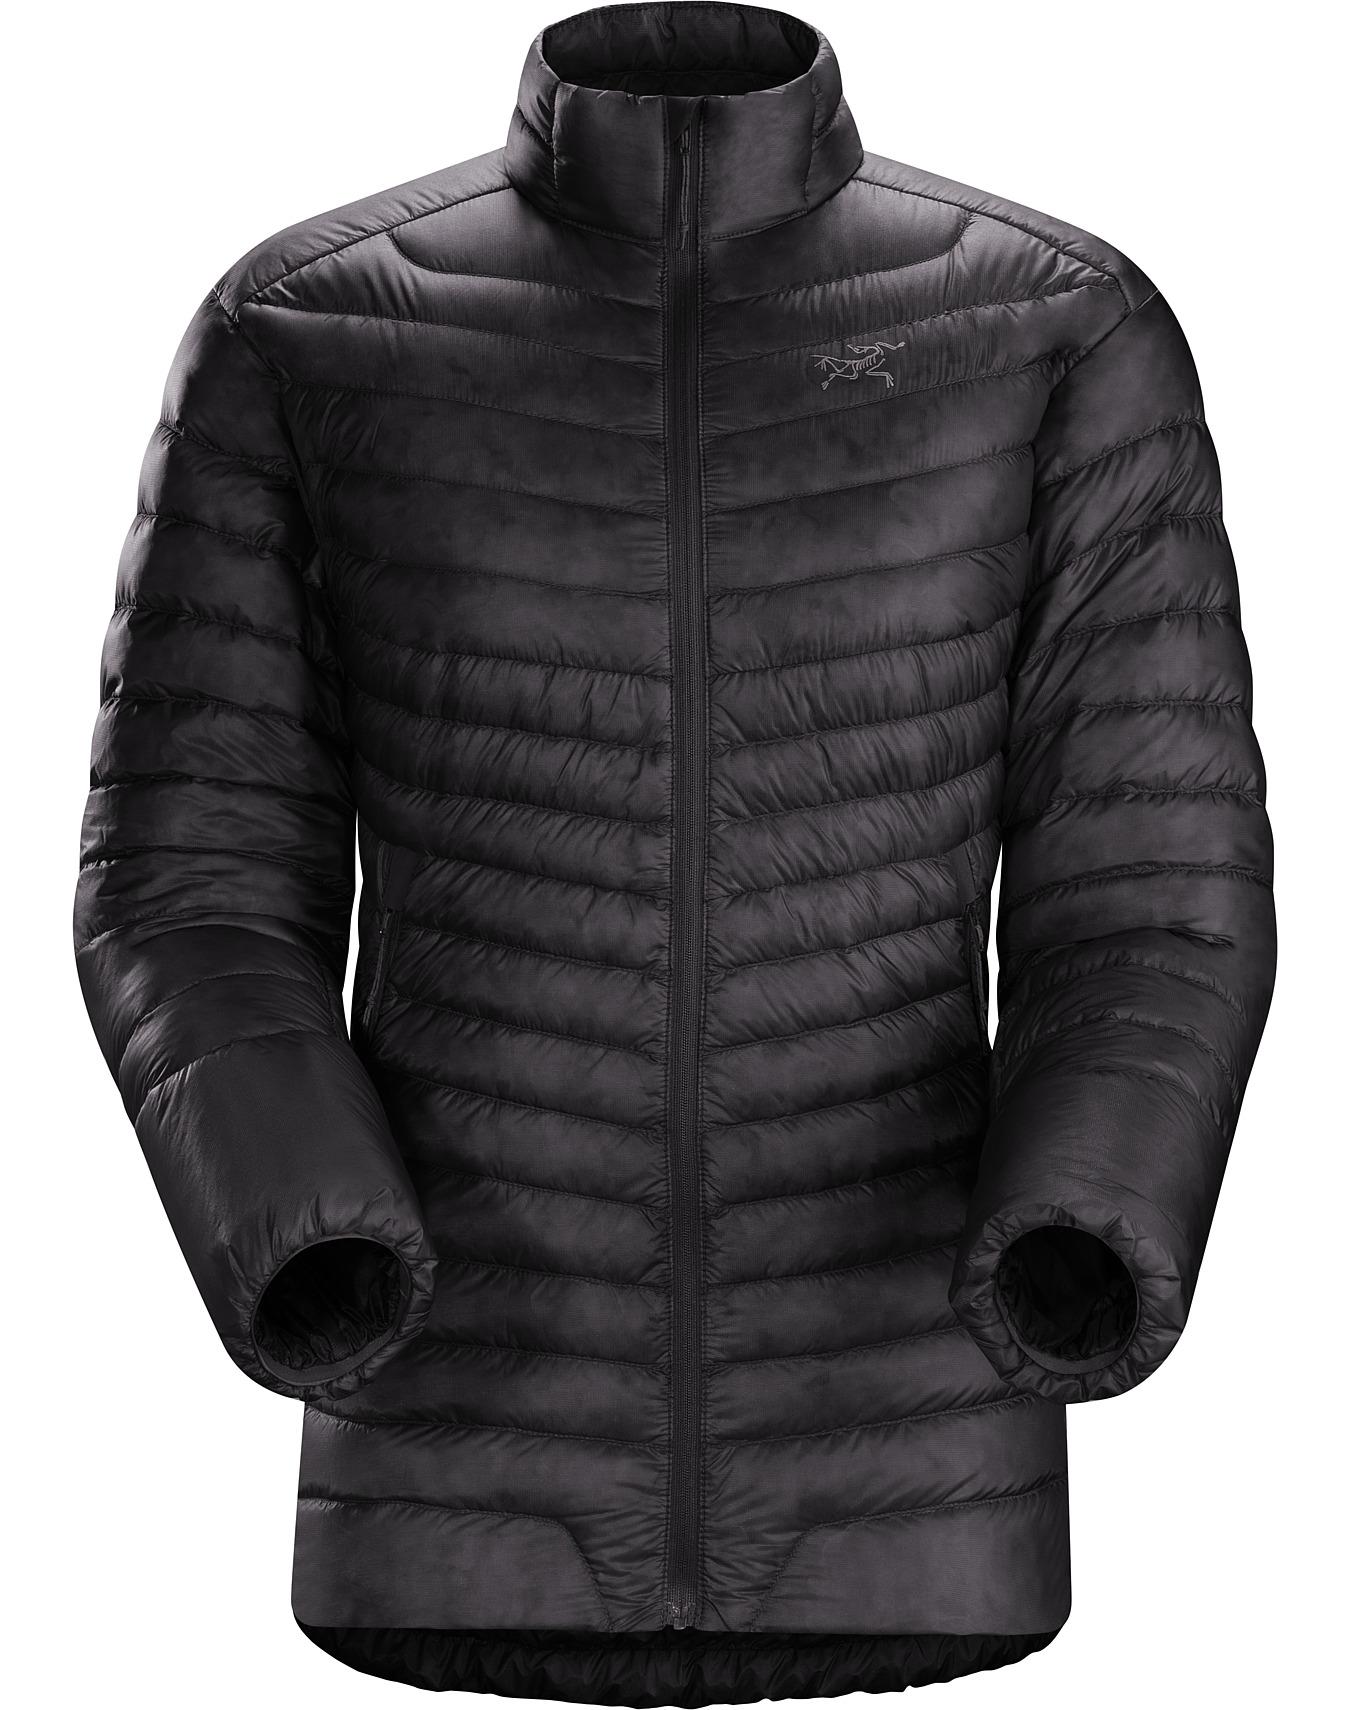 Cerium-SL-Jacket-W-Black.jpg